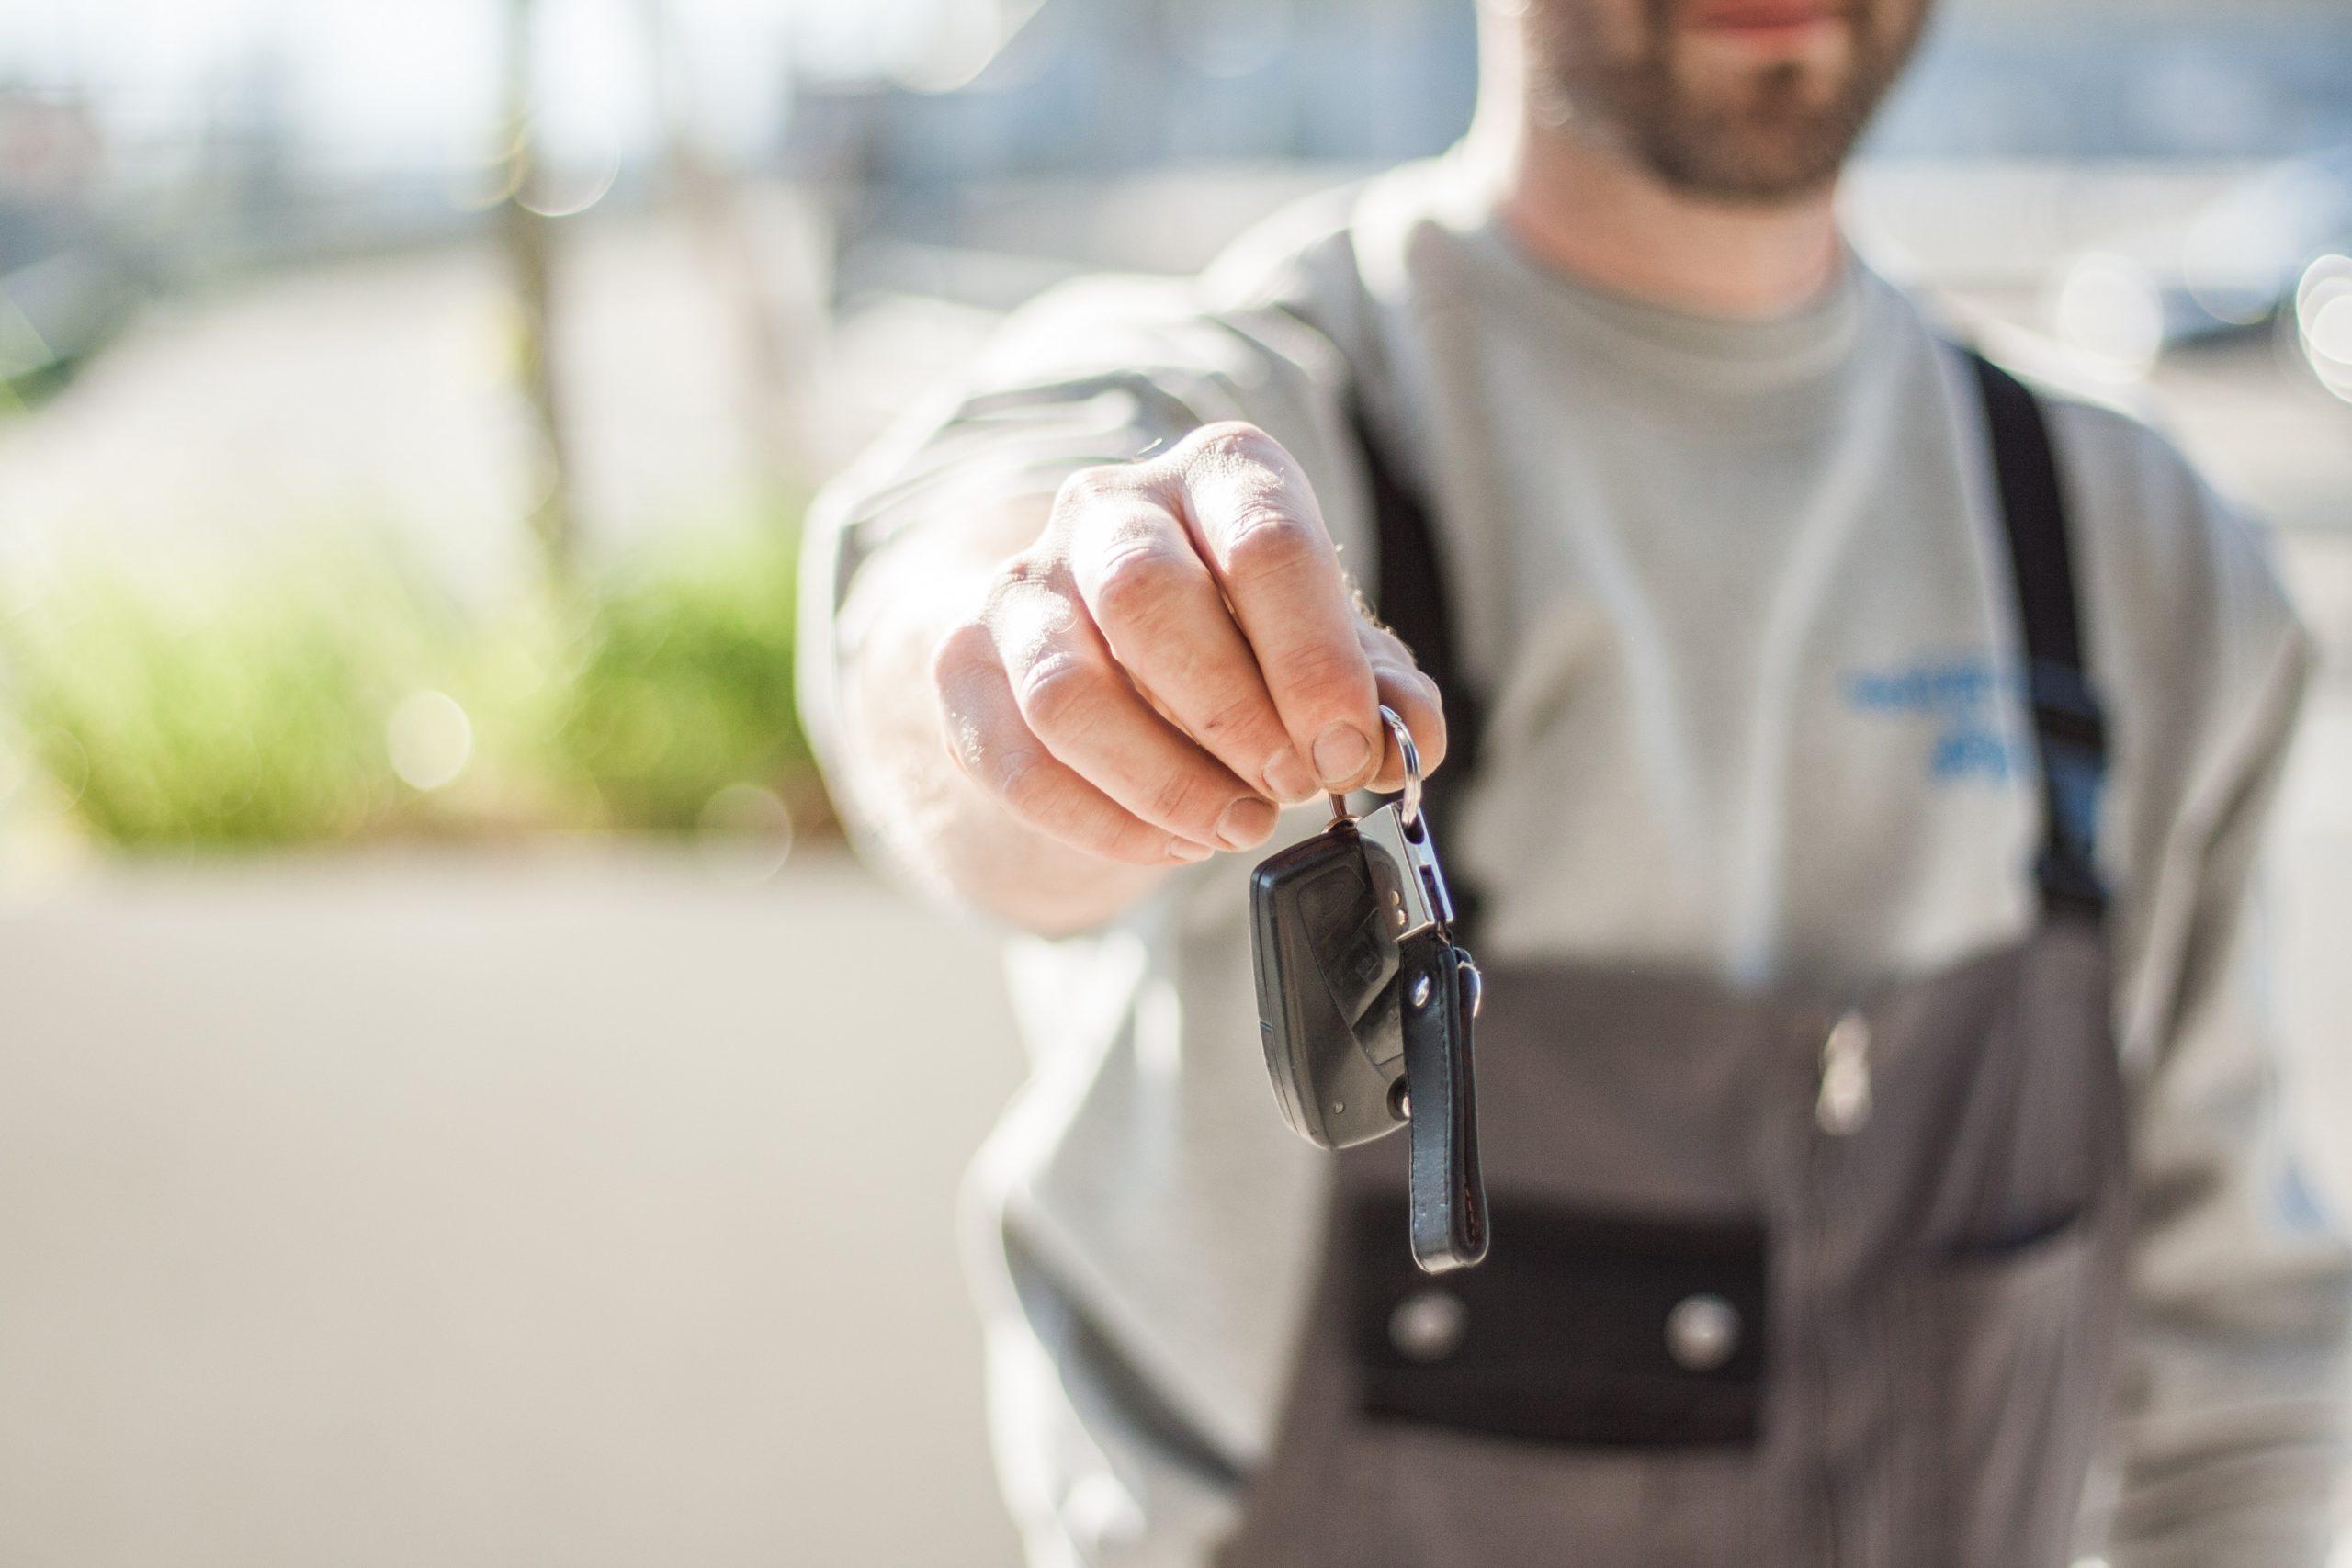 mechanic holding keys IN front of him outside